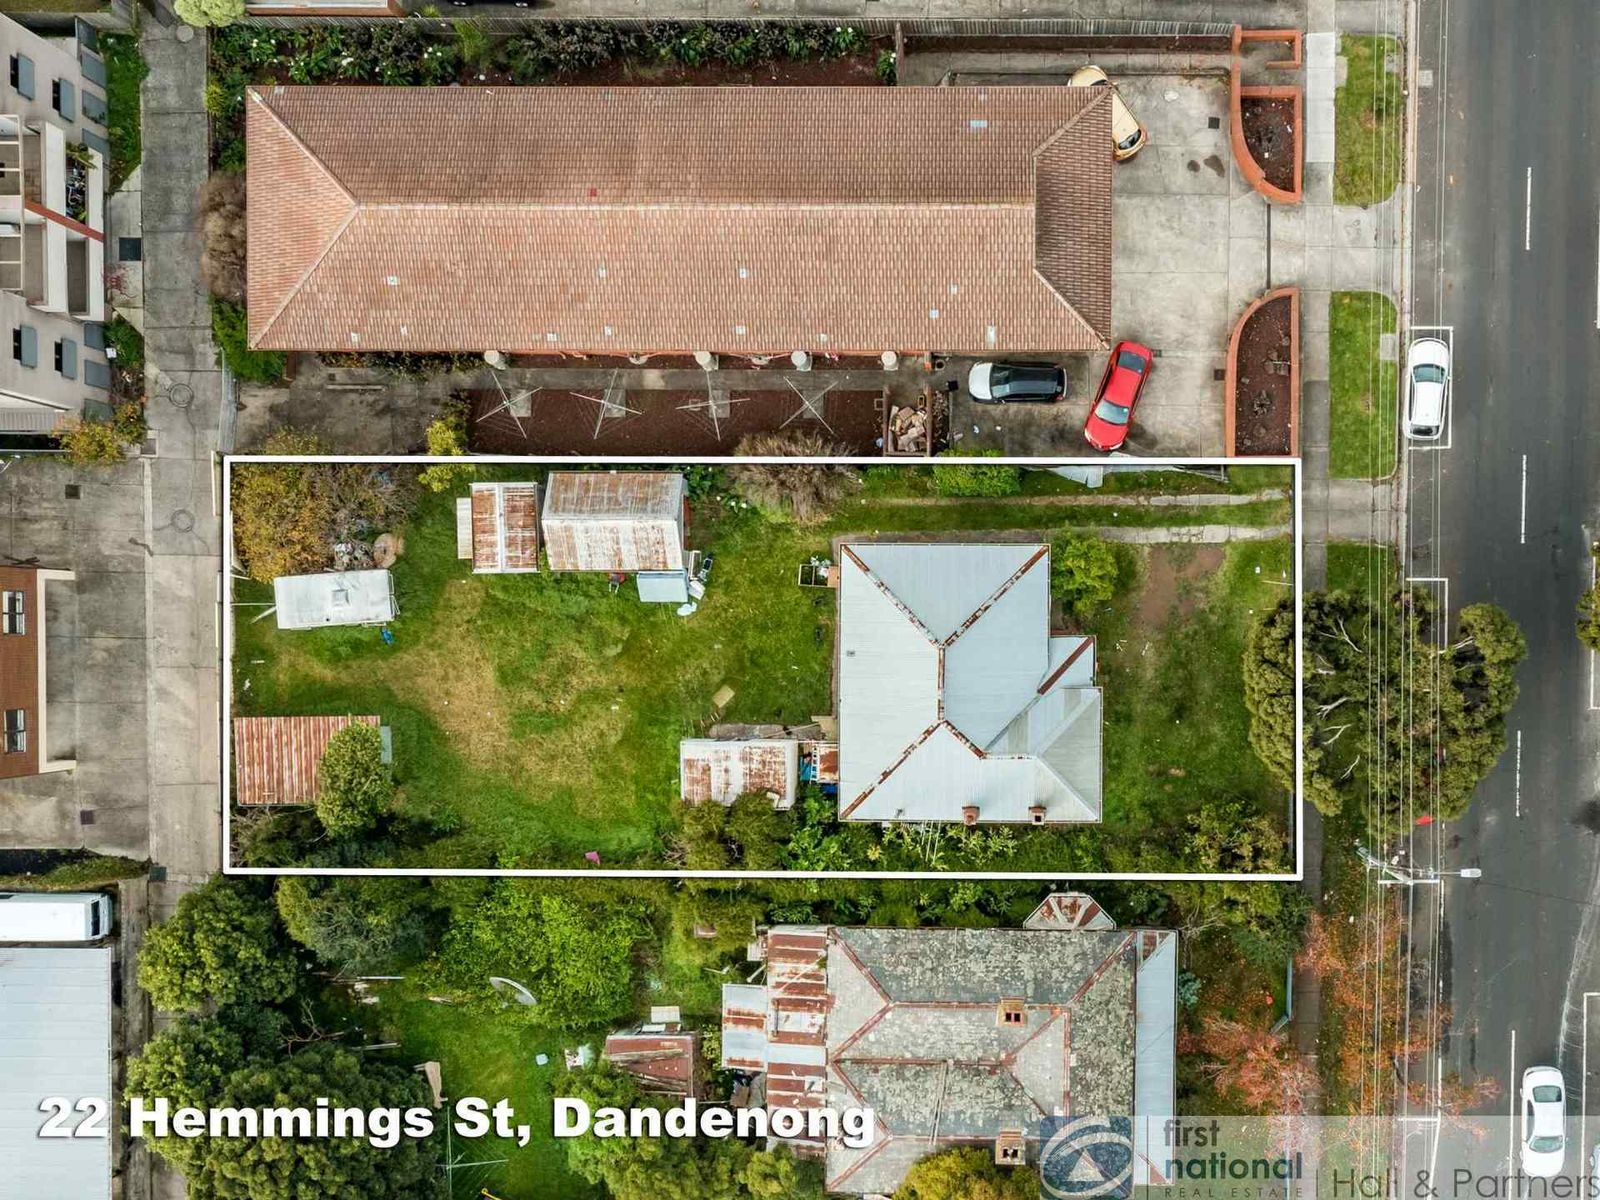 22 Hemmings Street, Dandenong, VIC 3175